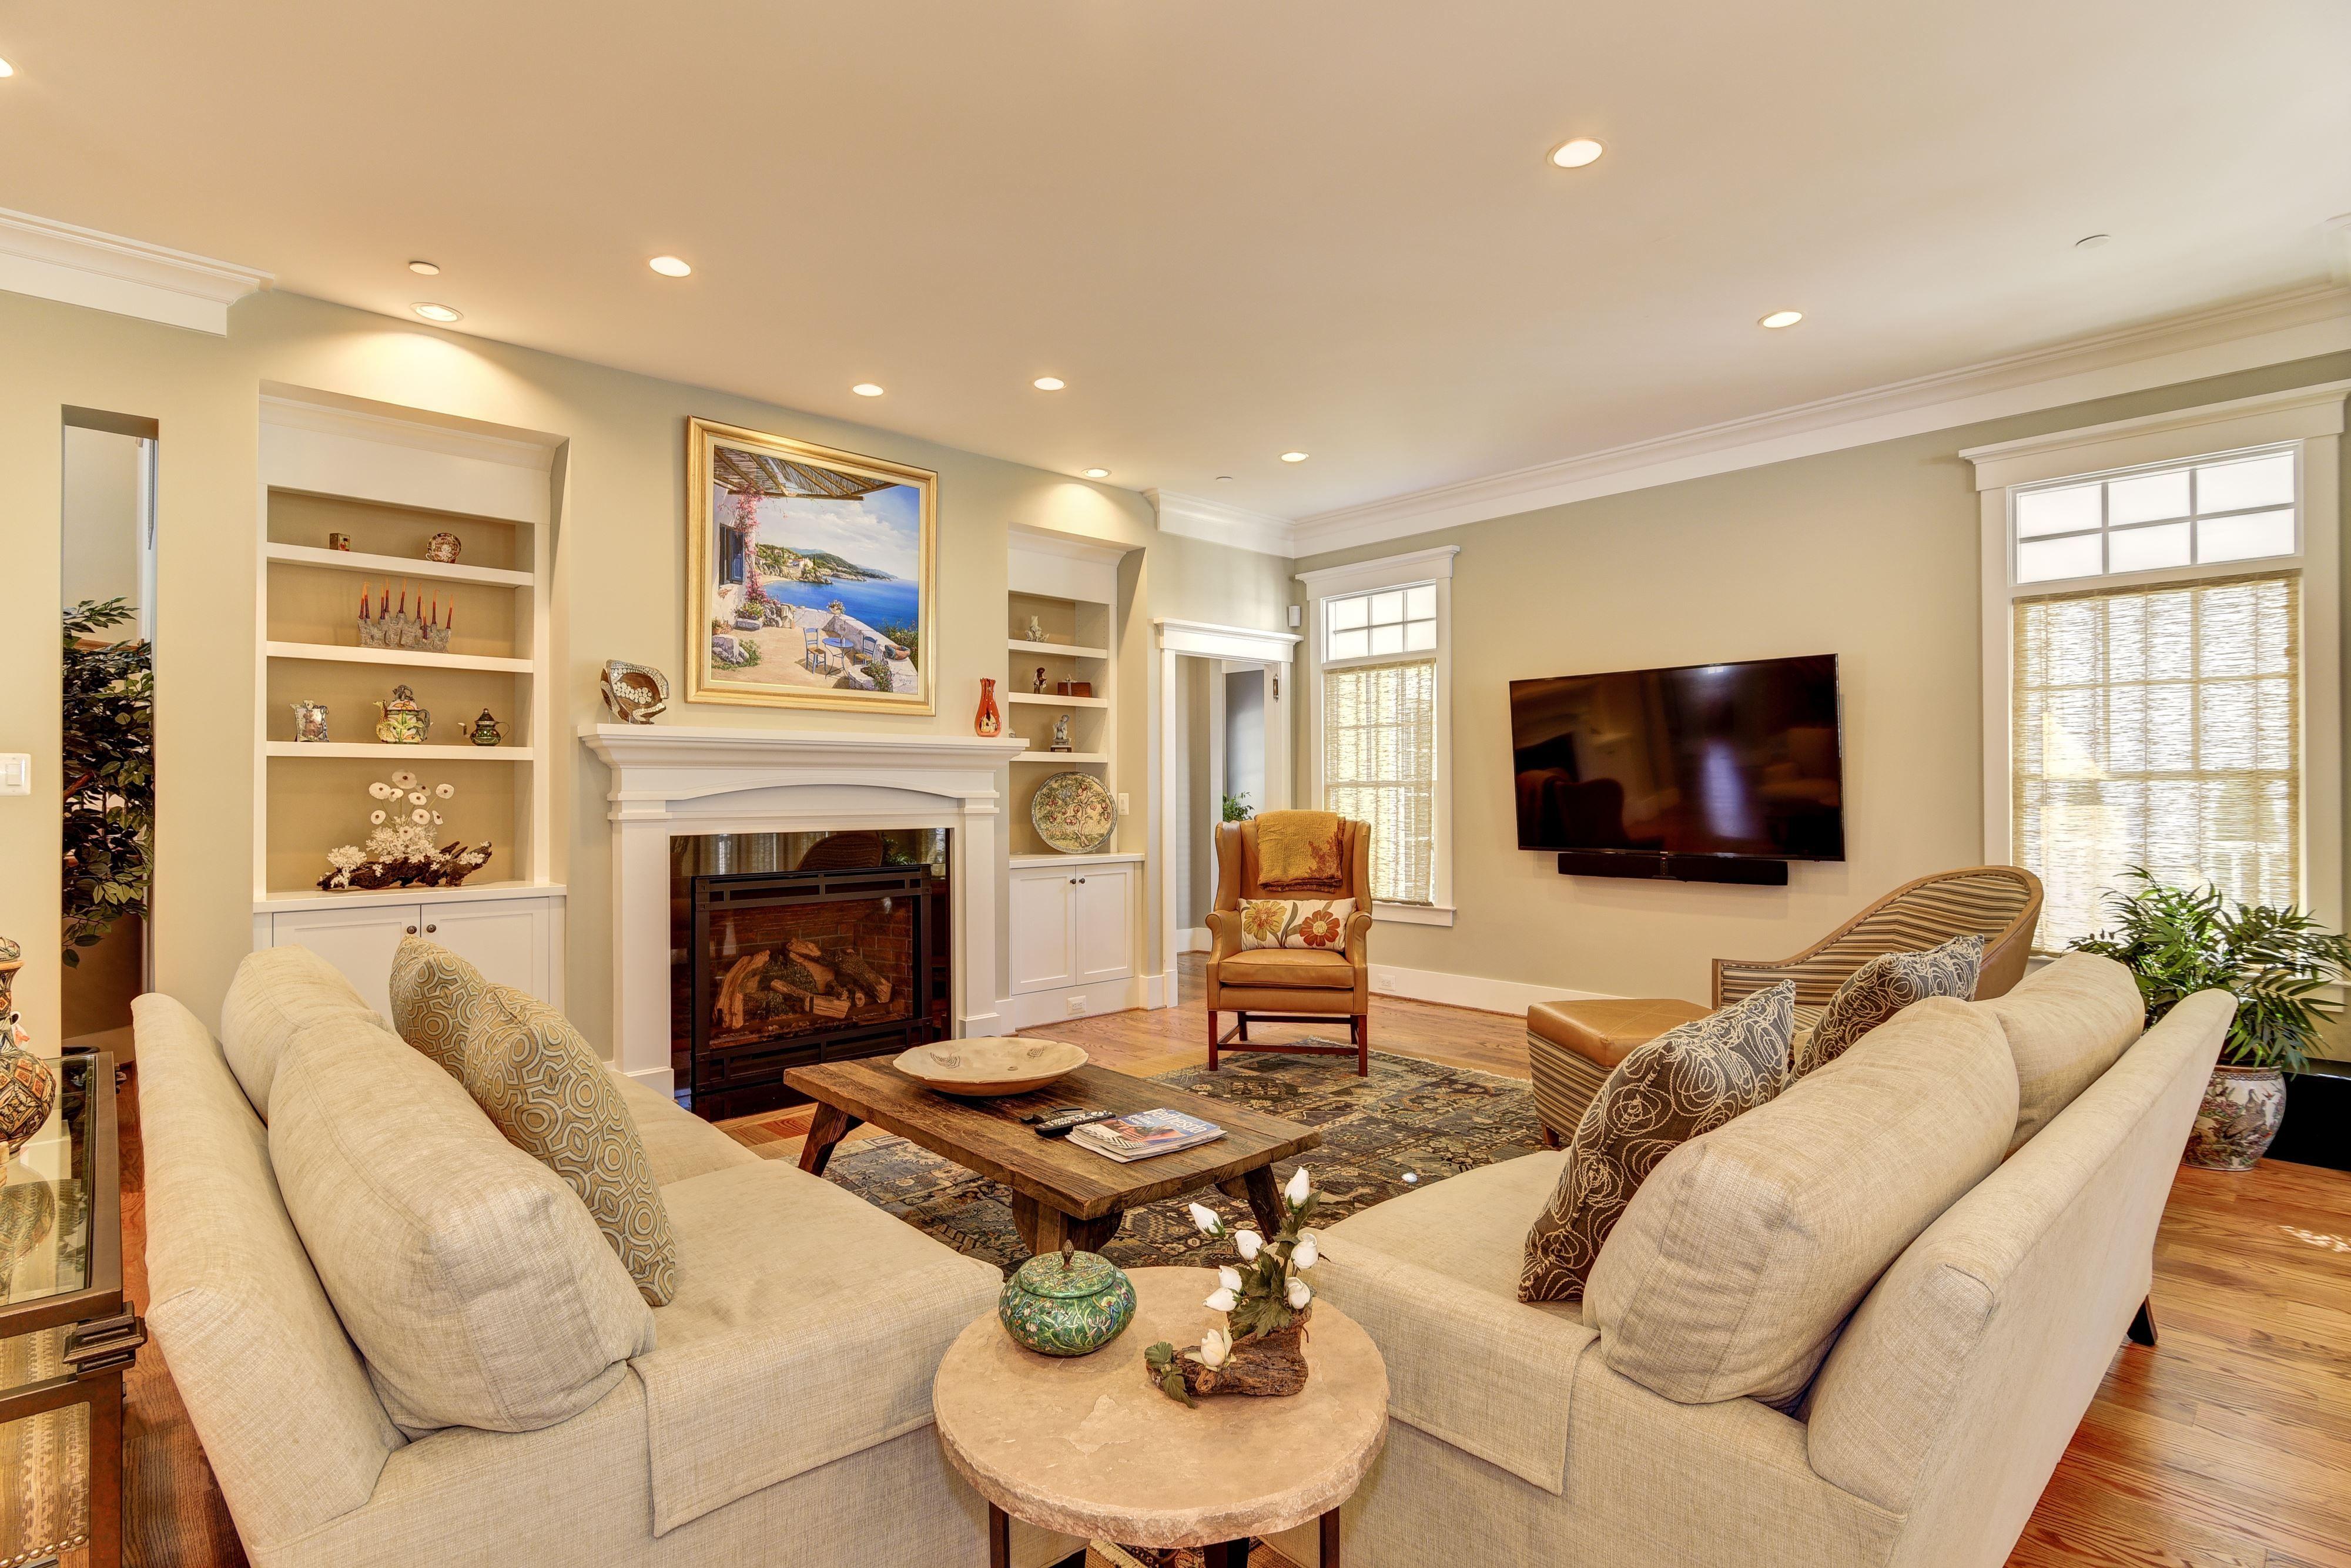 Small Volume Customized Home $700,000 - $849,999 Company: Mid-Atlantic Custom Builders Model: Ravello City: Bethesda, MD